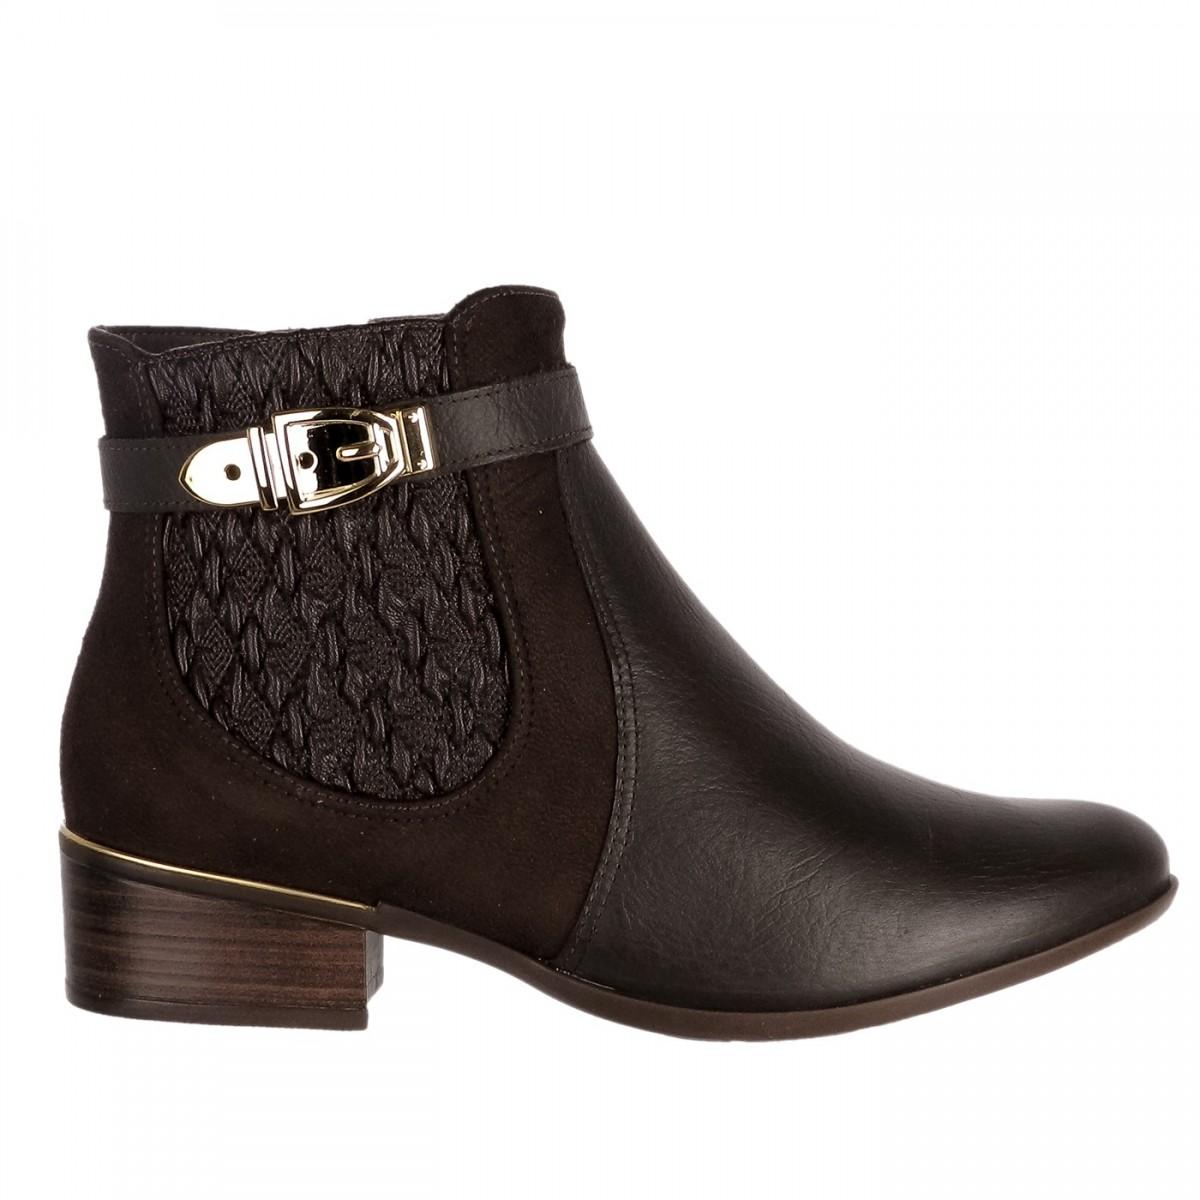 d97a11746 Bizz Store - Bota Feminina Comfortflex Cano Curto Couro Marrom